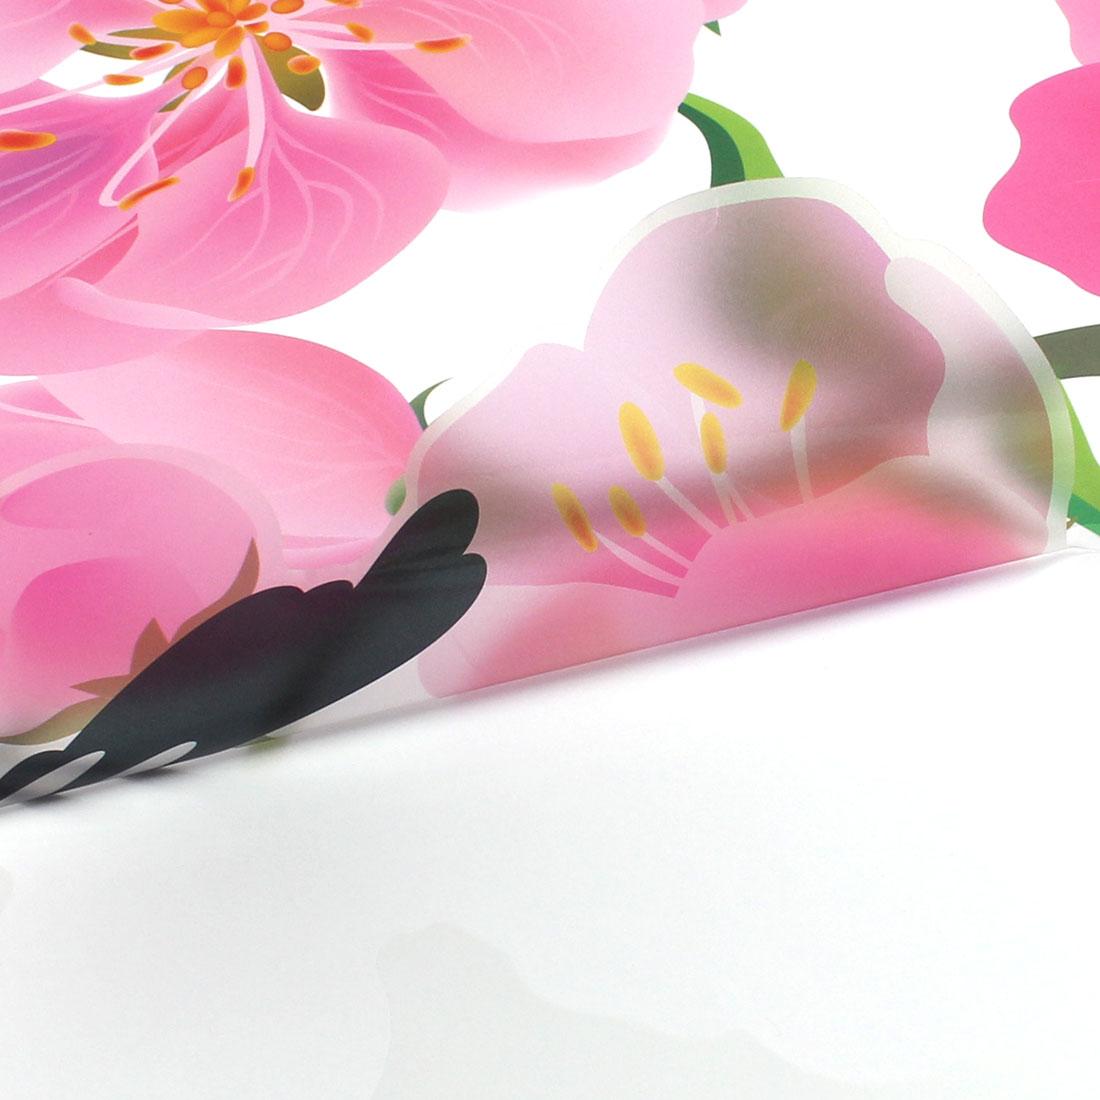 Household Flower Bird Pattern Removable Wall Sticker Decoration - image 2 de 3